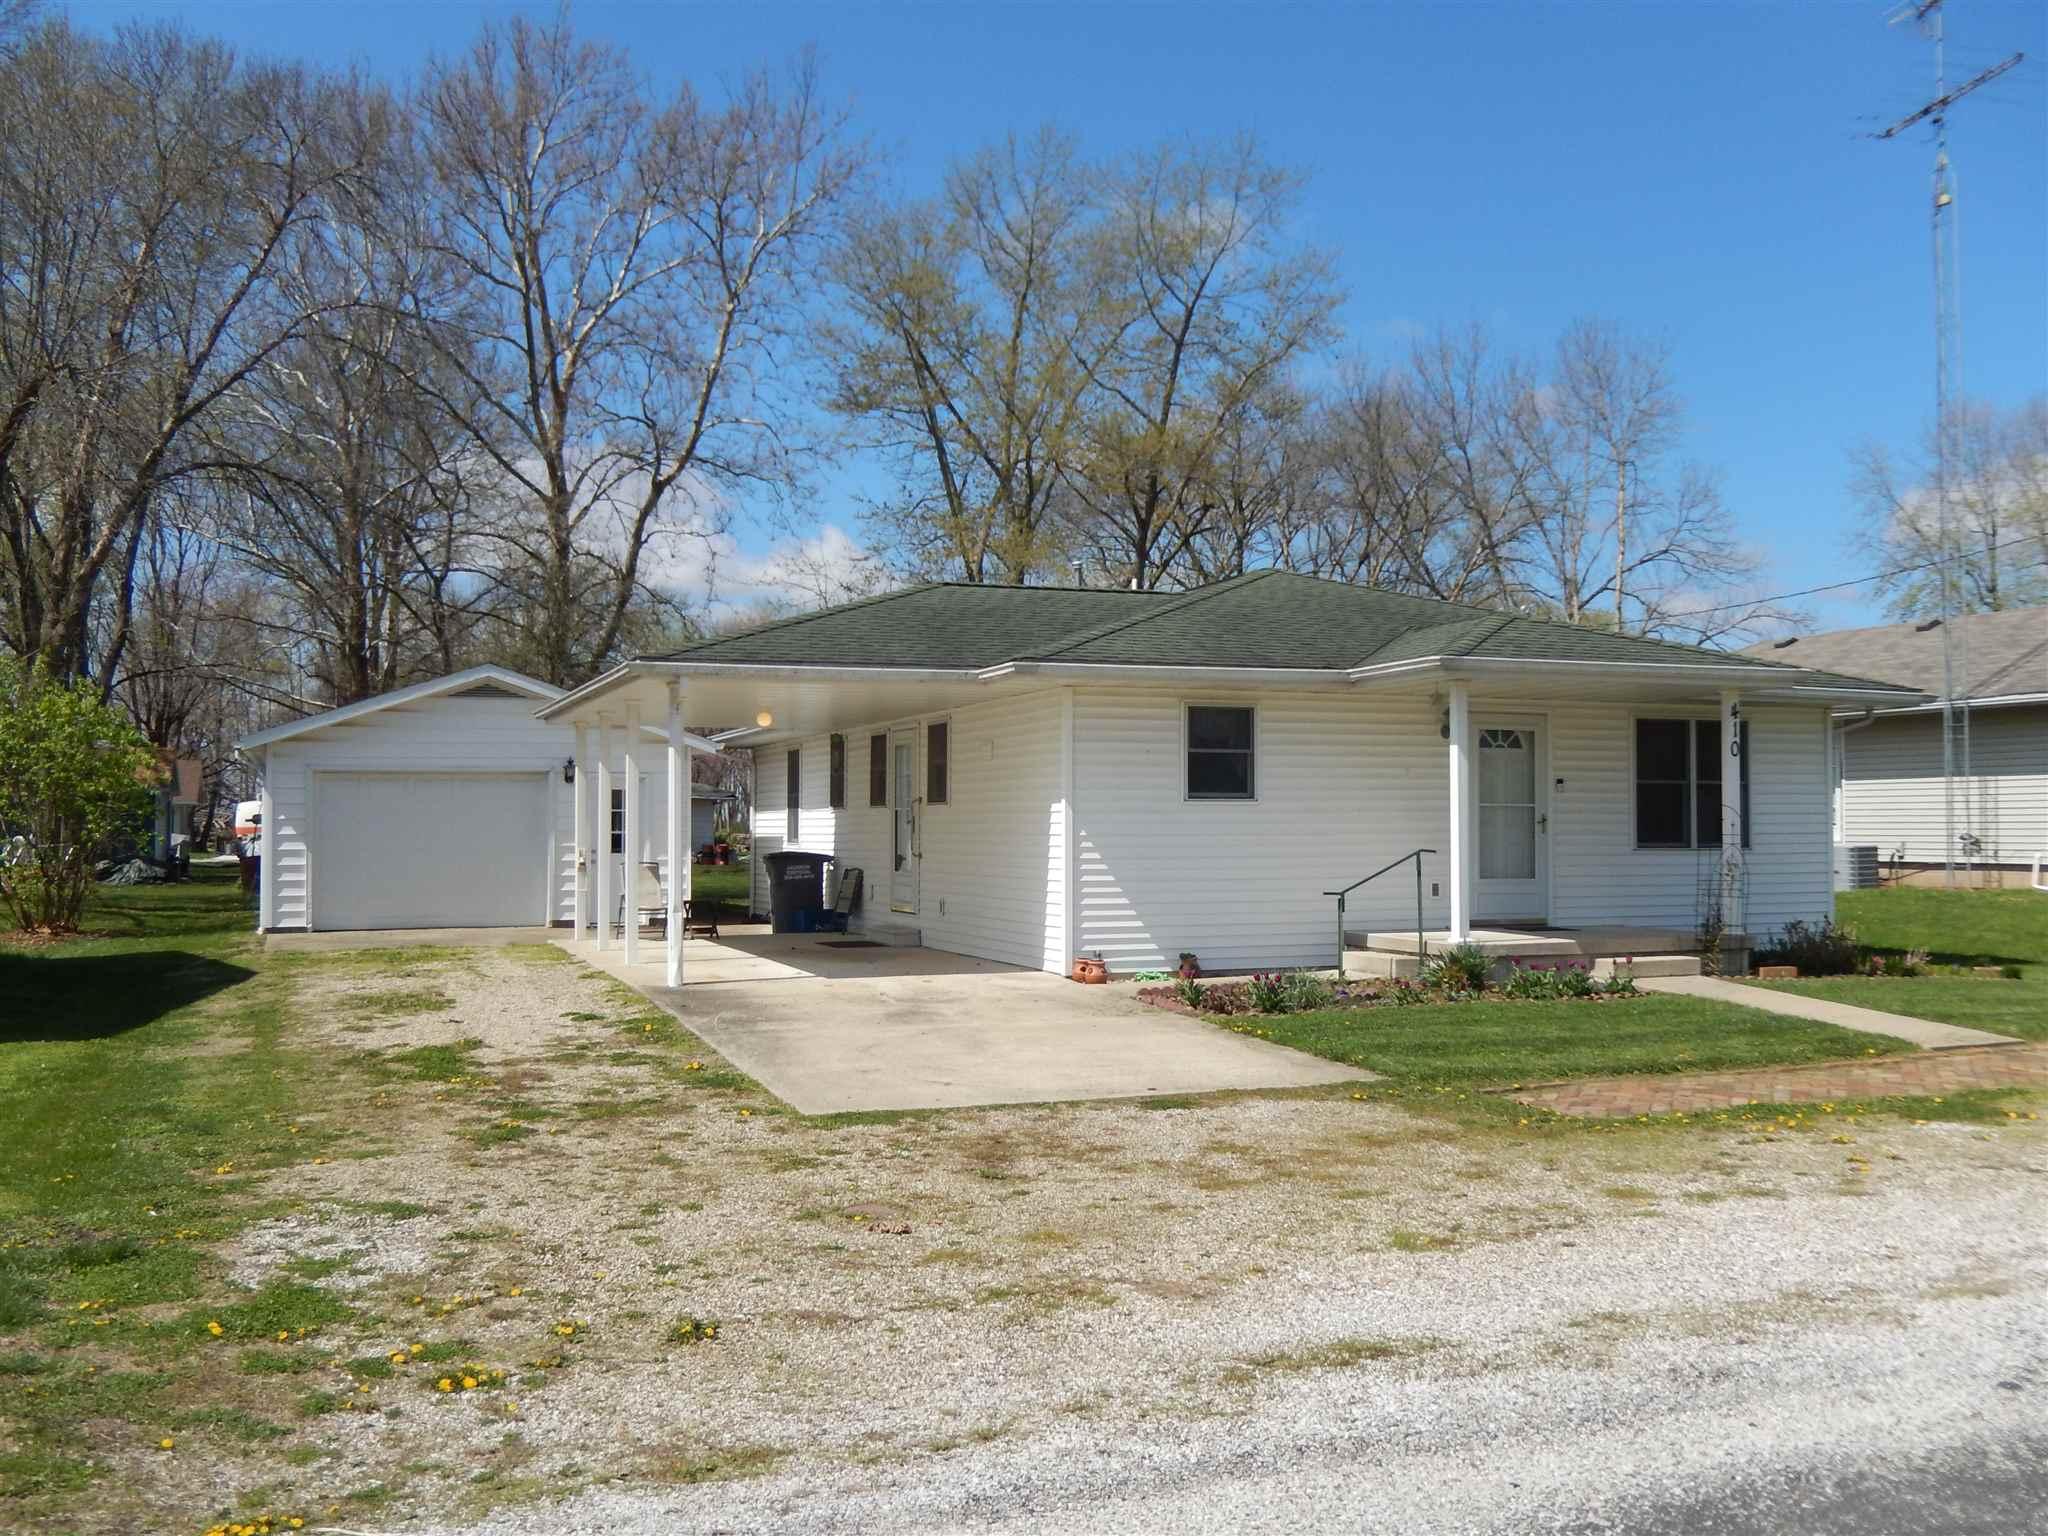 410 S WILLIAMS Property Photo - Colchester, IL real estate listing